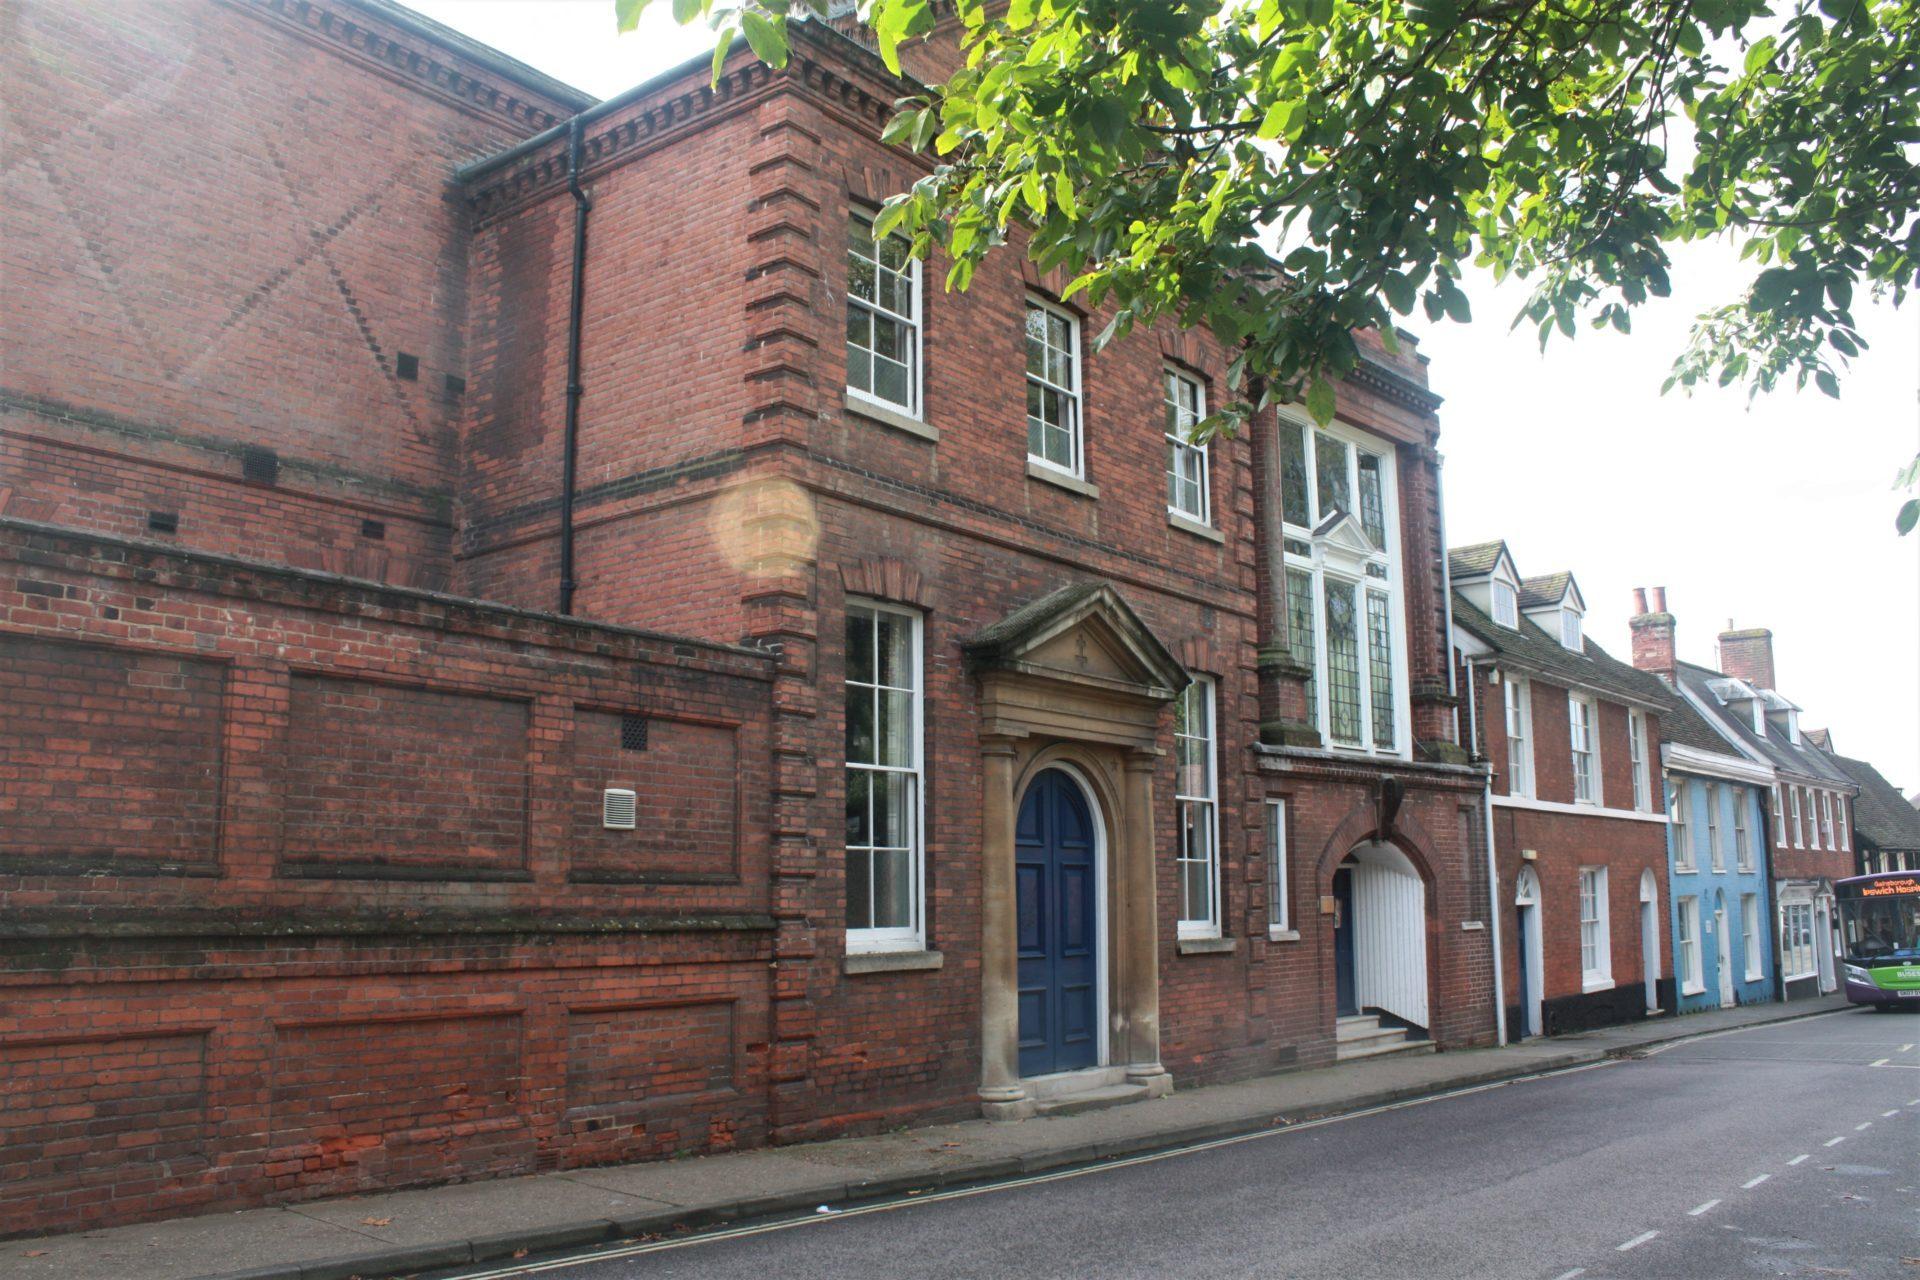 Masonic Hall Ipswich